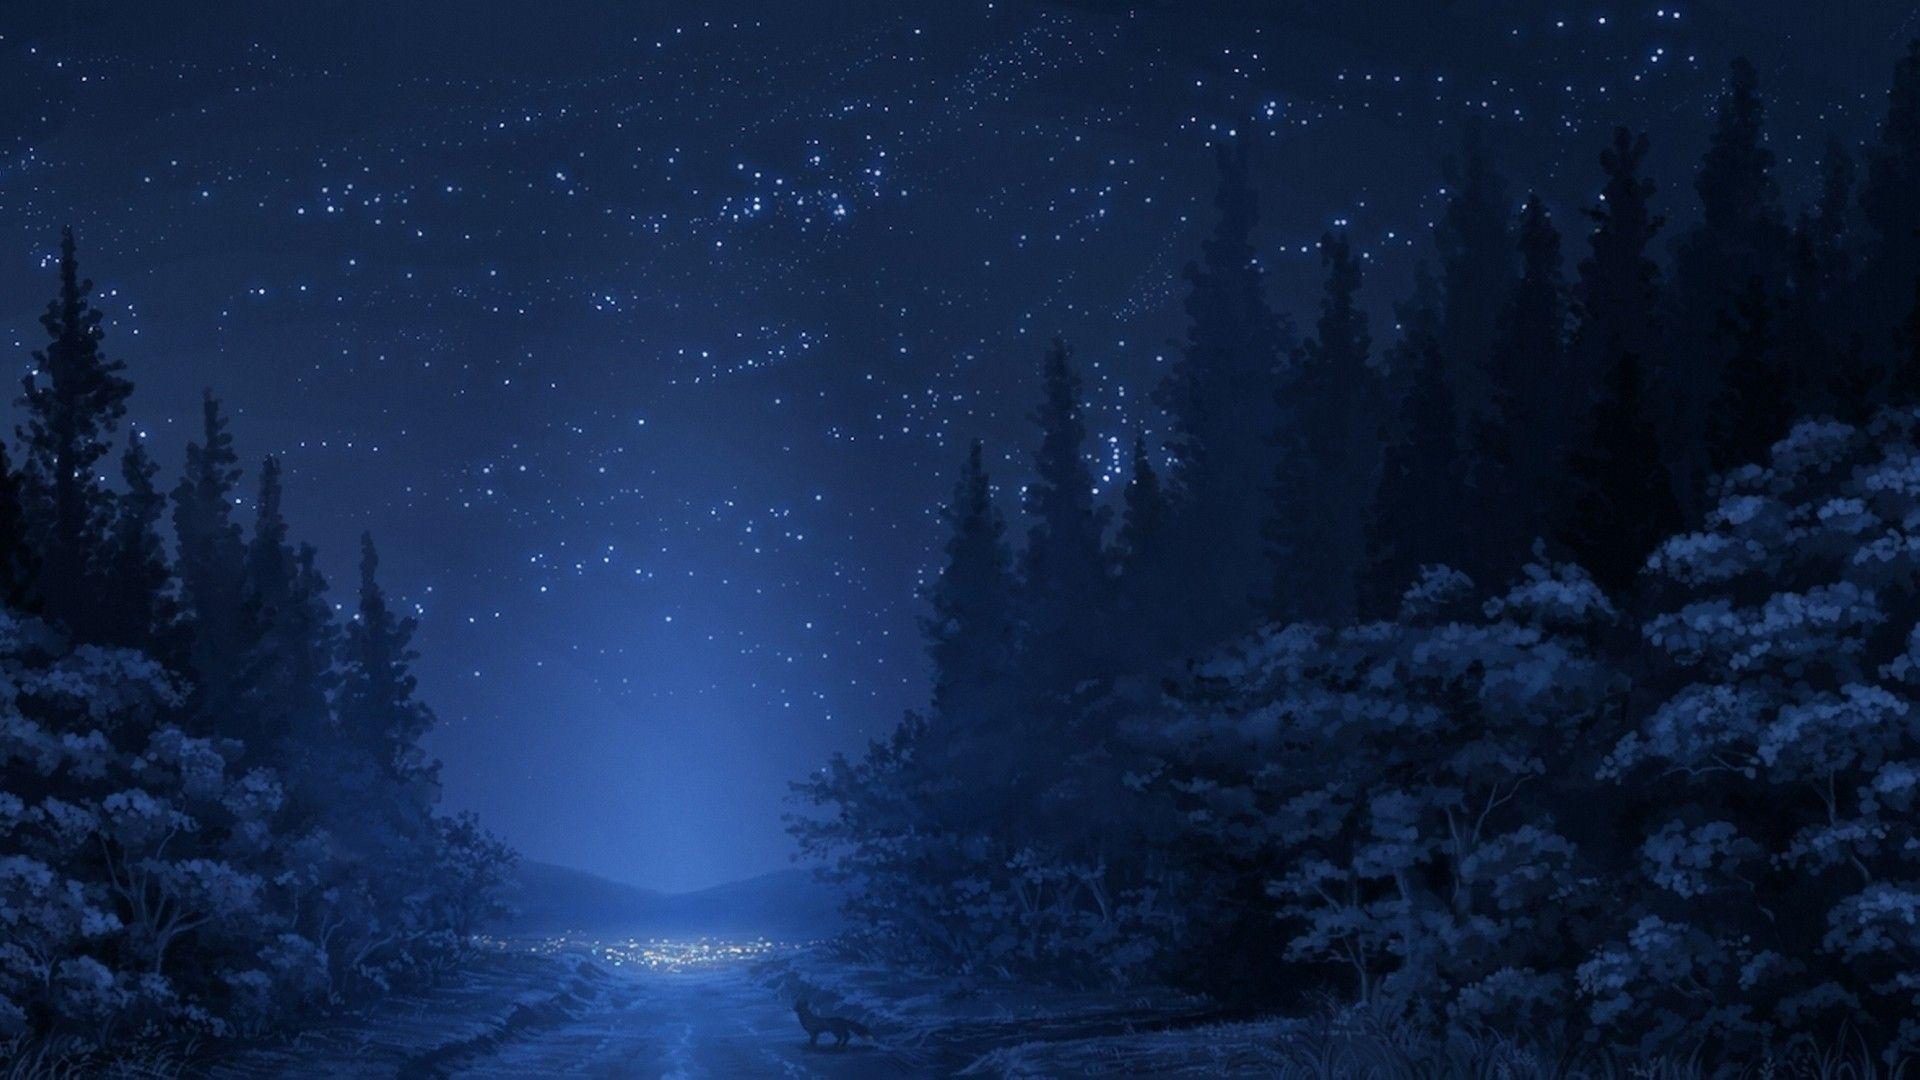 Anime Forest Trees Landscape Fox Road Sky Stars Artwork Night Wallpaper Anime Scenery Anime Scenery Wallpaper Night Scenery